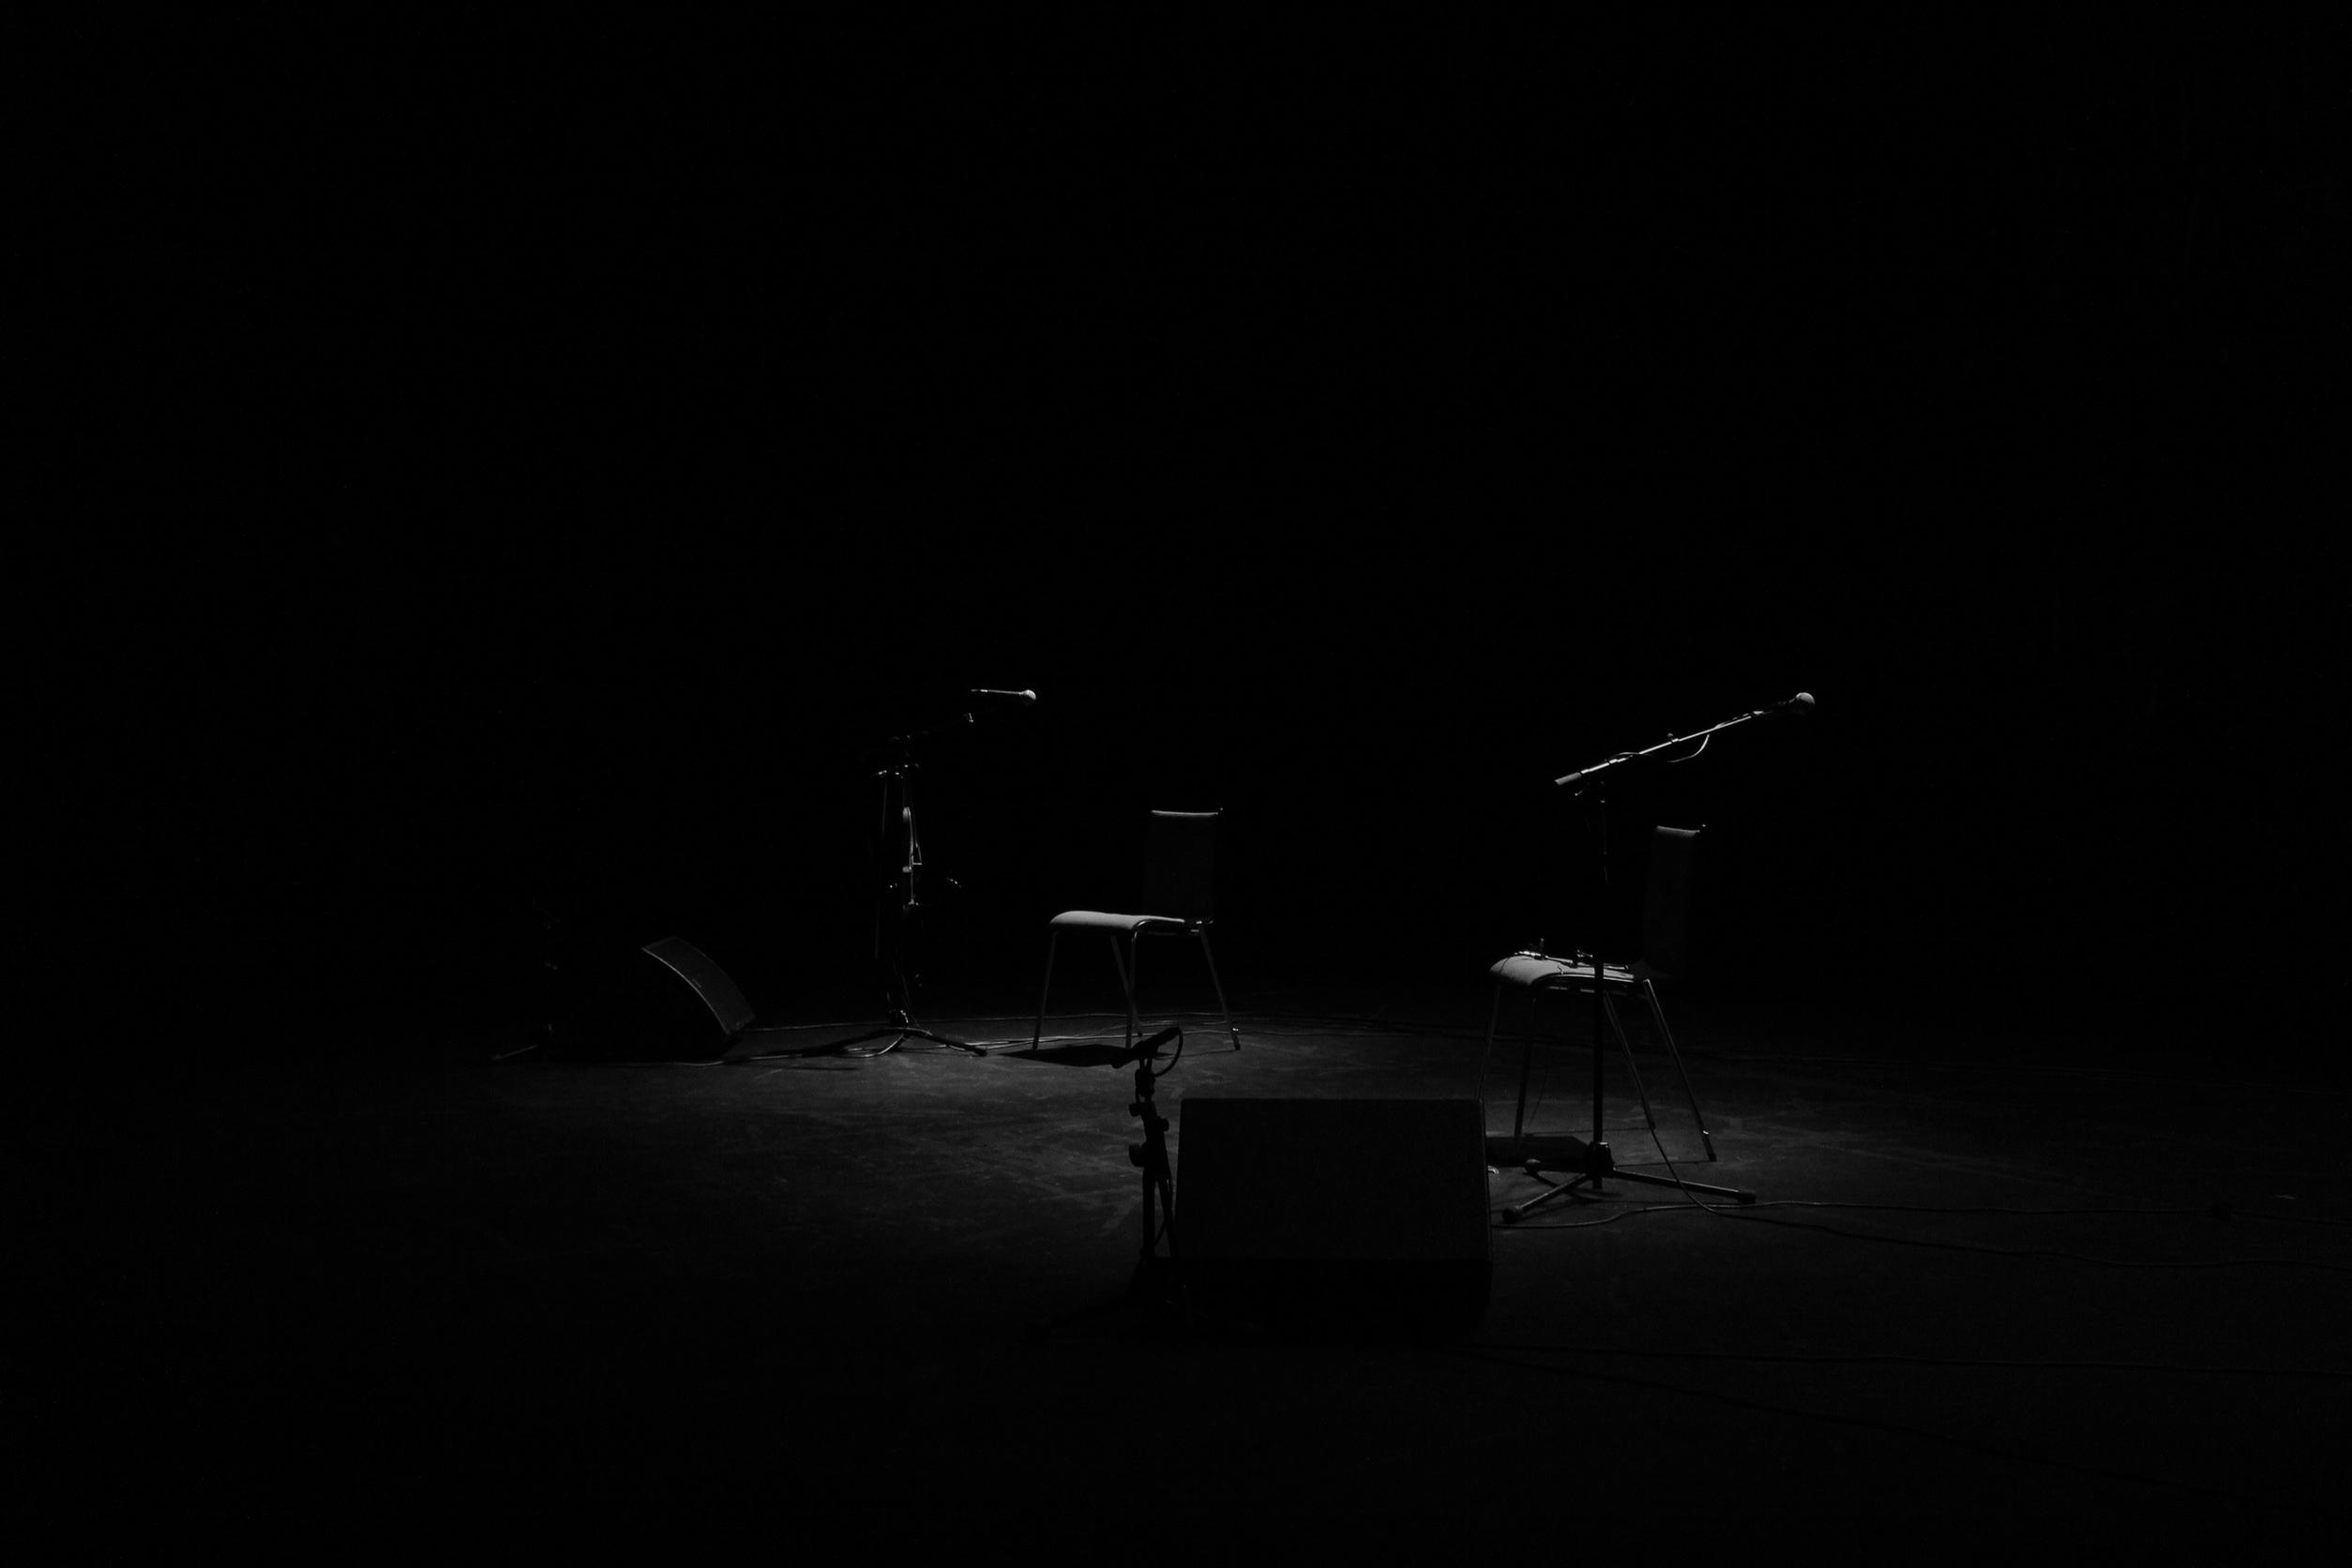 Light Black And White Night Atmosphere Dark Studio Darkness Empty Room Monochrome Lighting Chairs